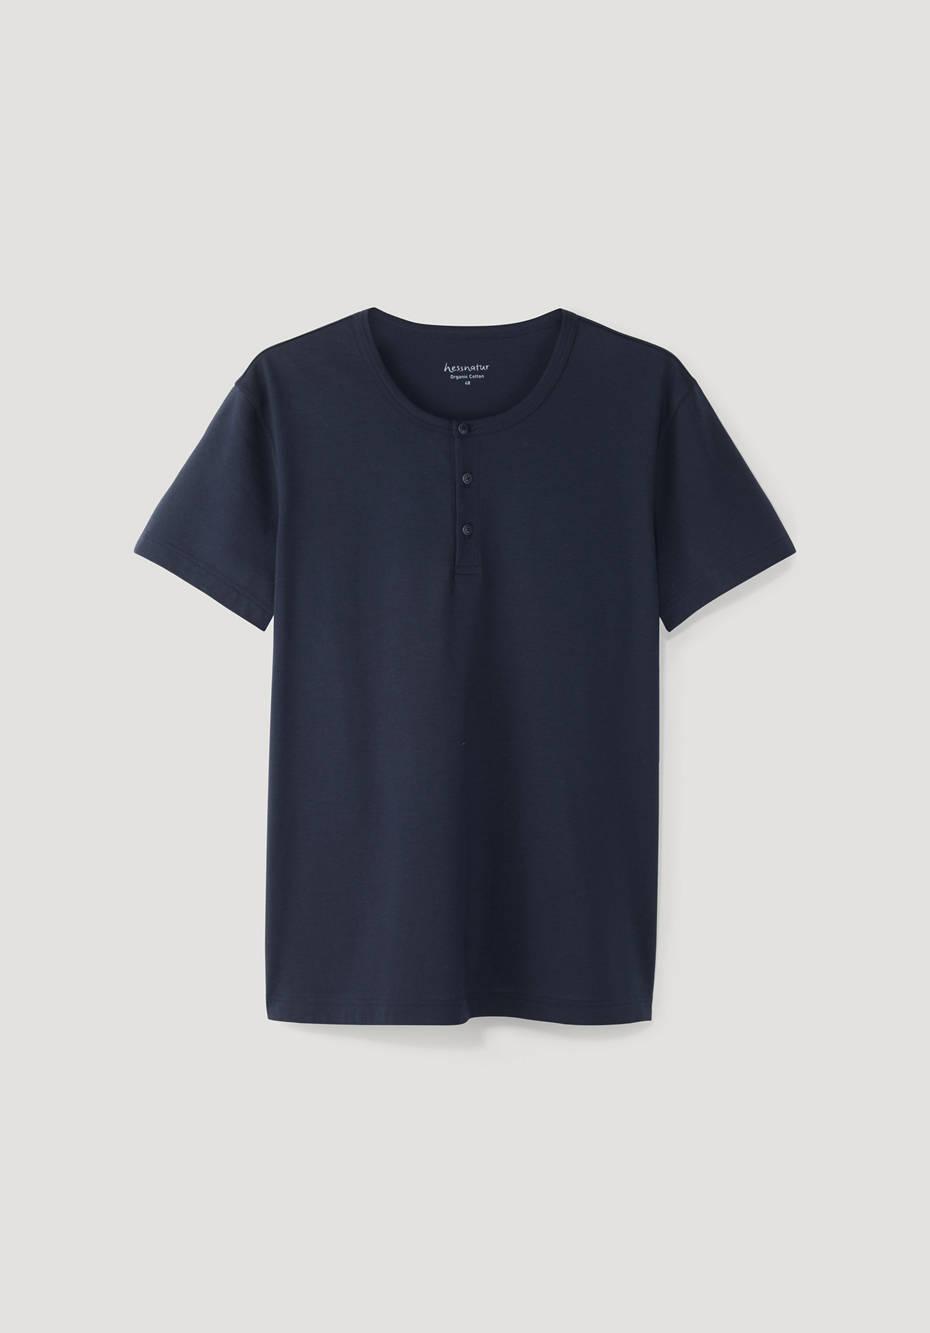 Henley shirt made of pure organic pima cotton